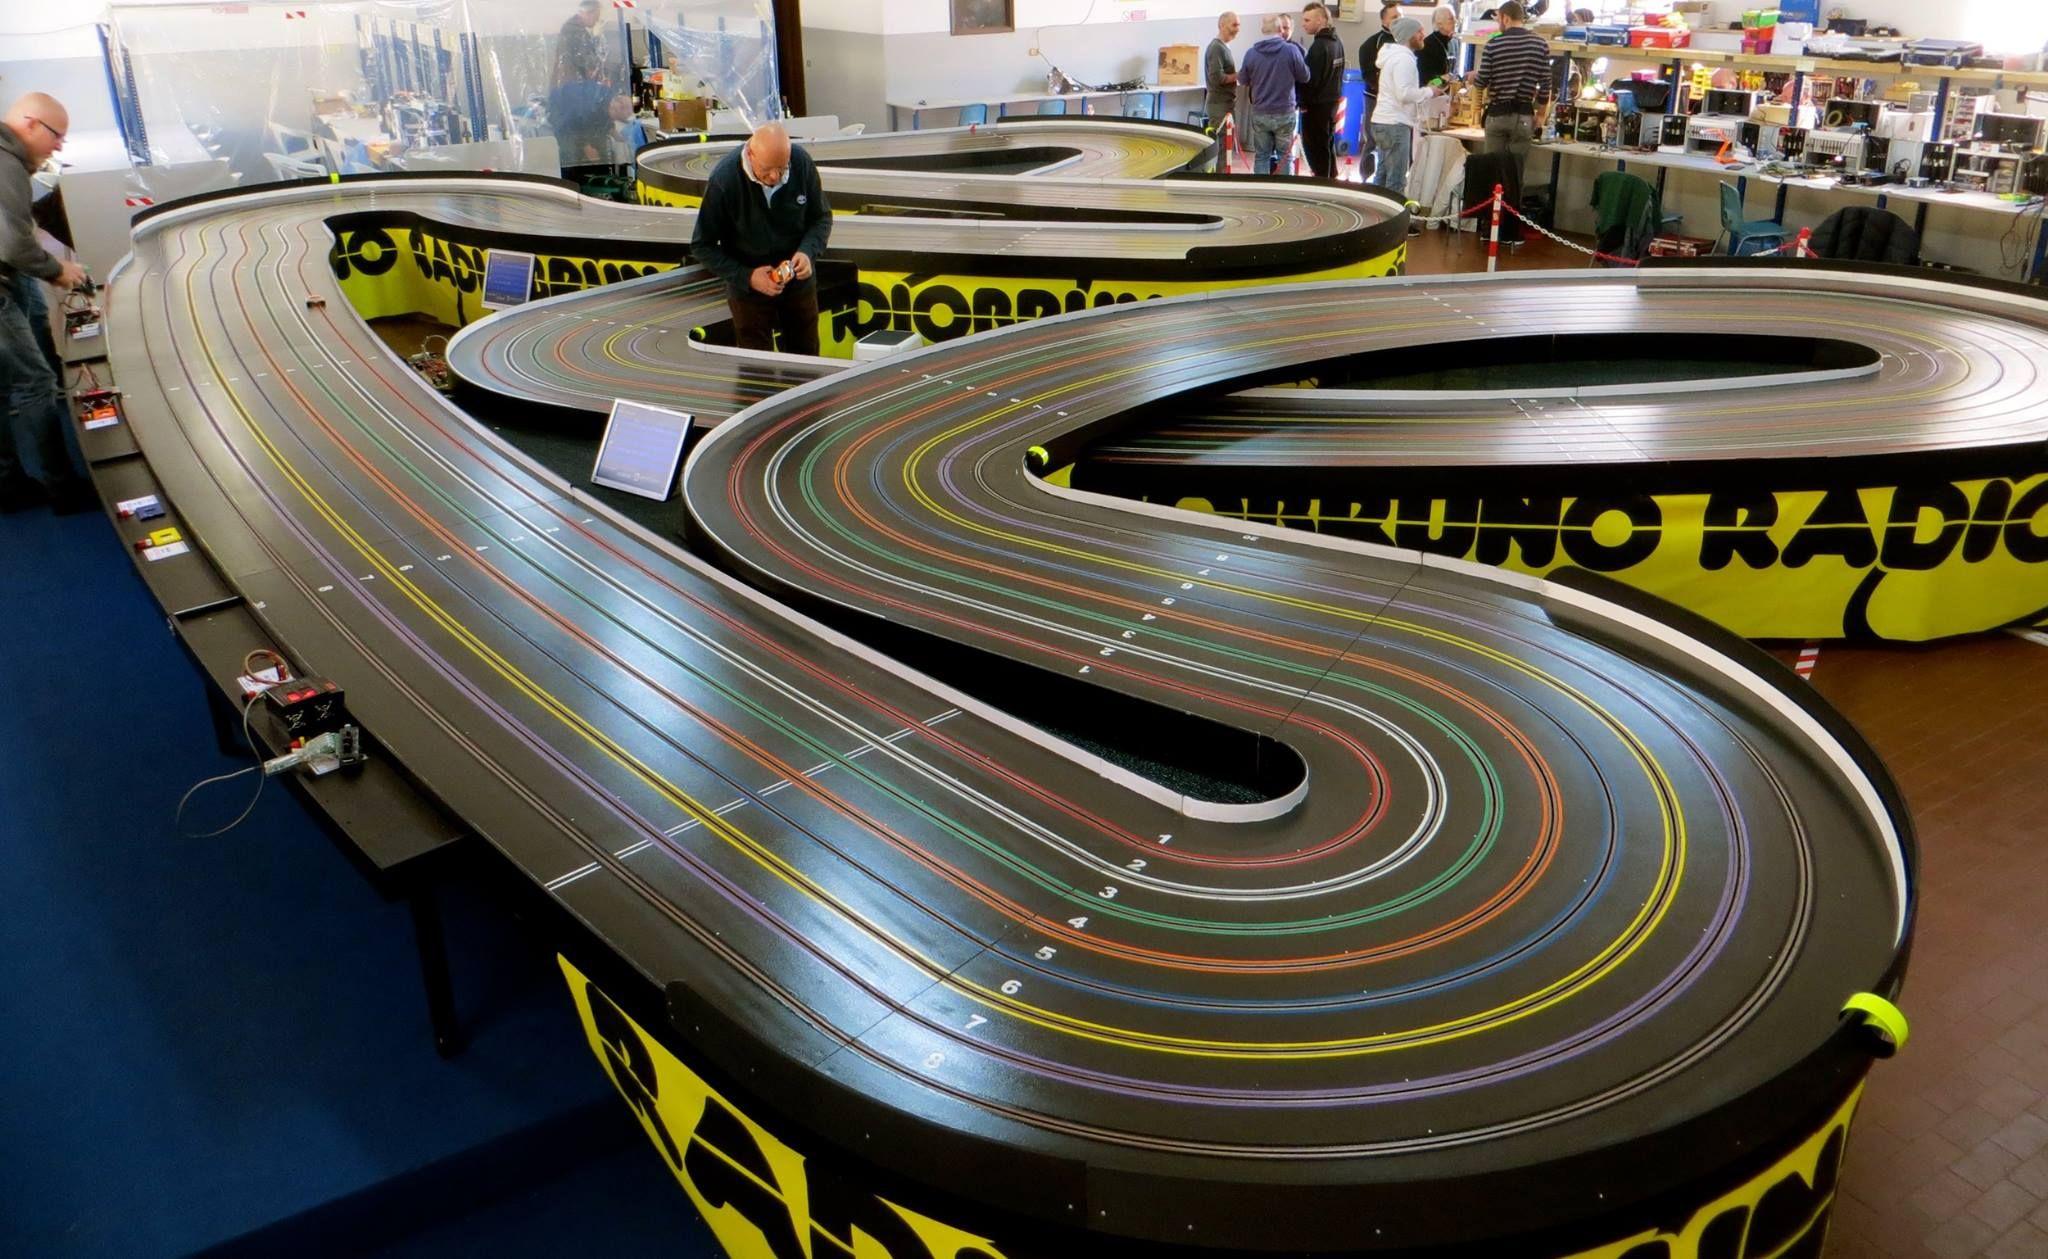 Tuscany Slot Club Slot Car Raceways Slot car racing